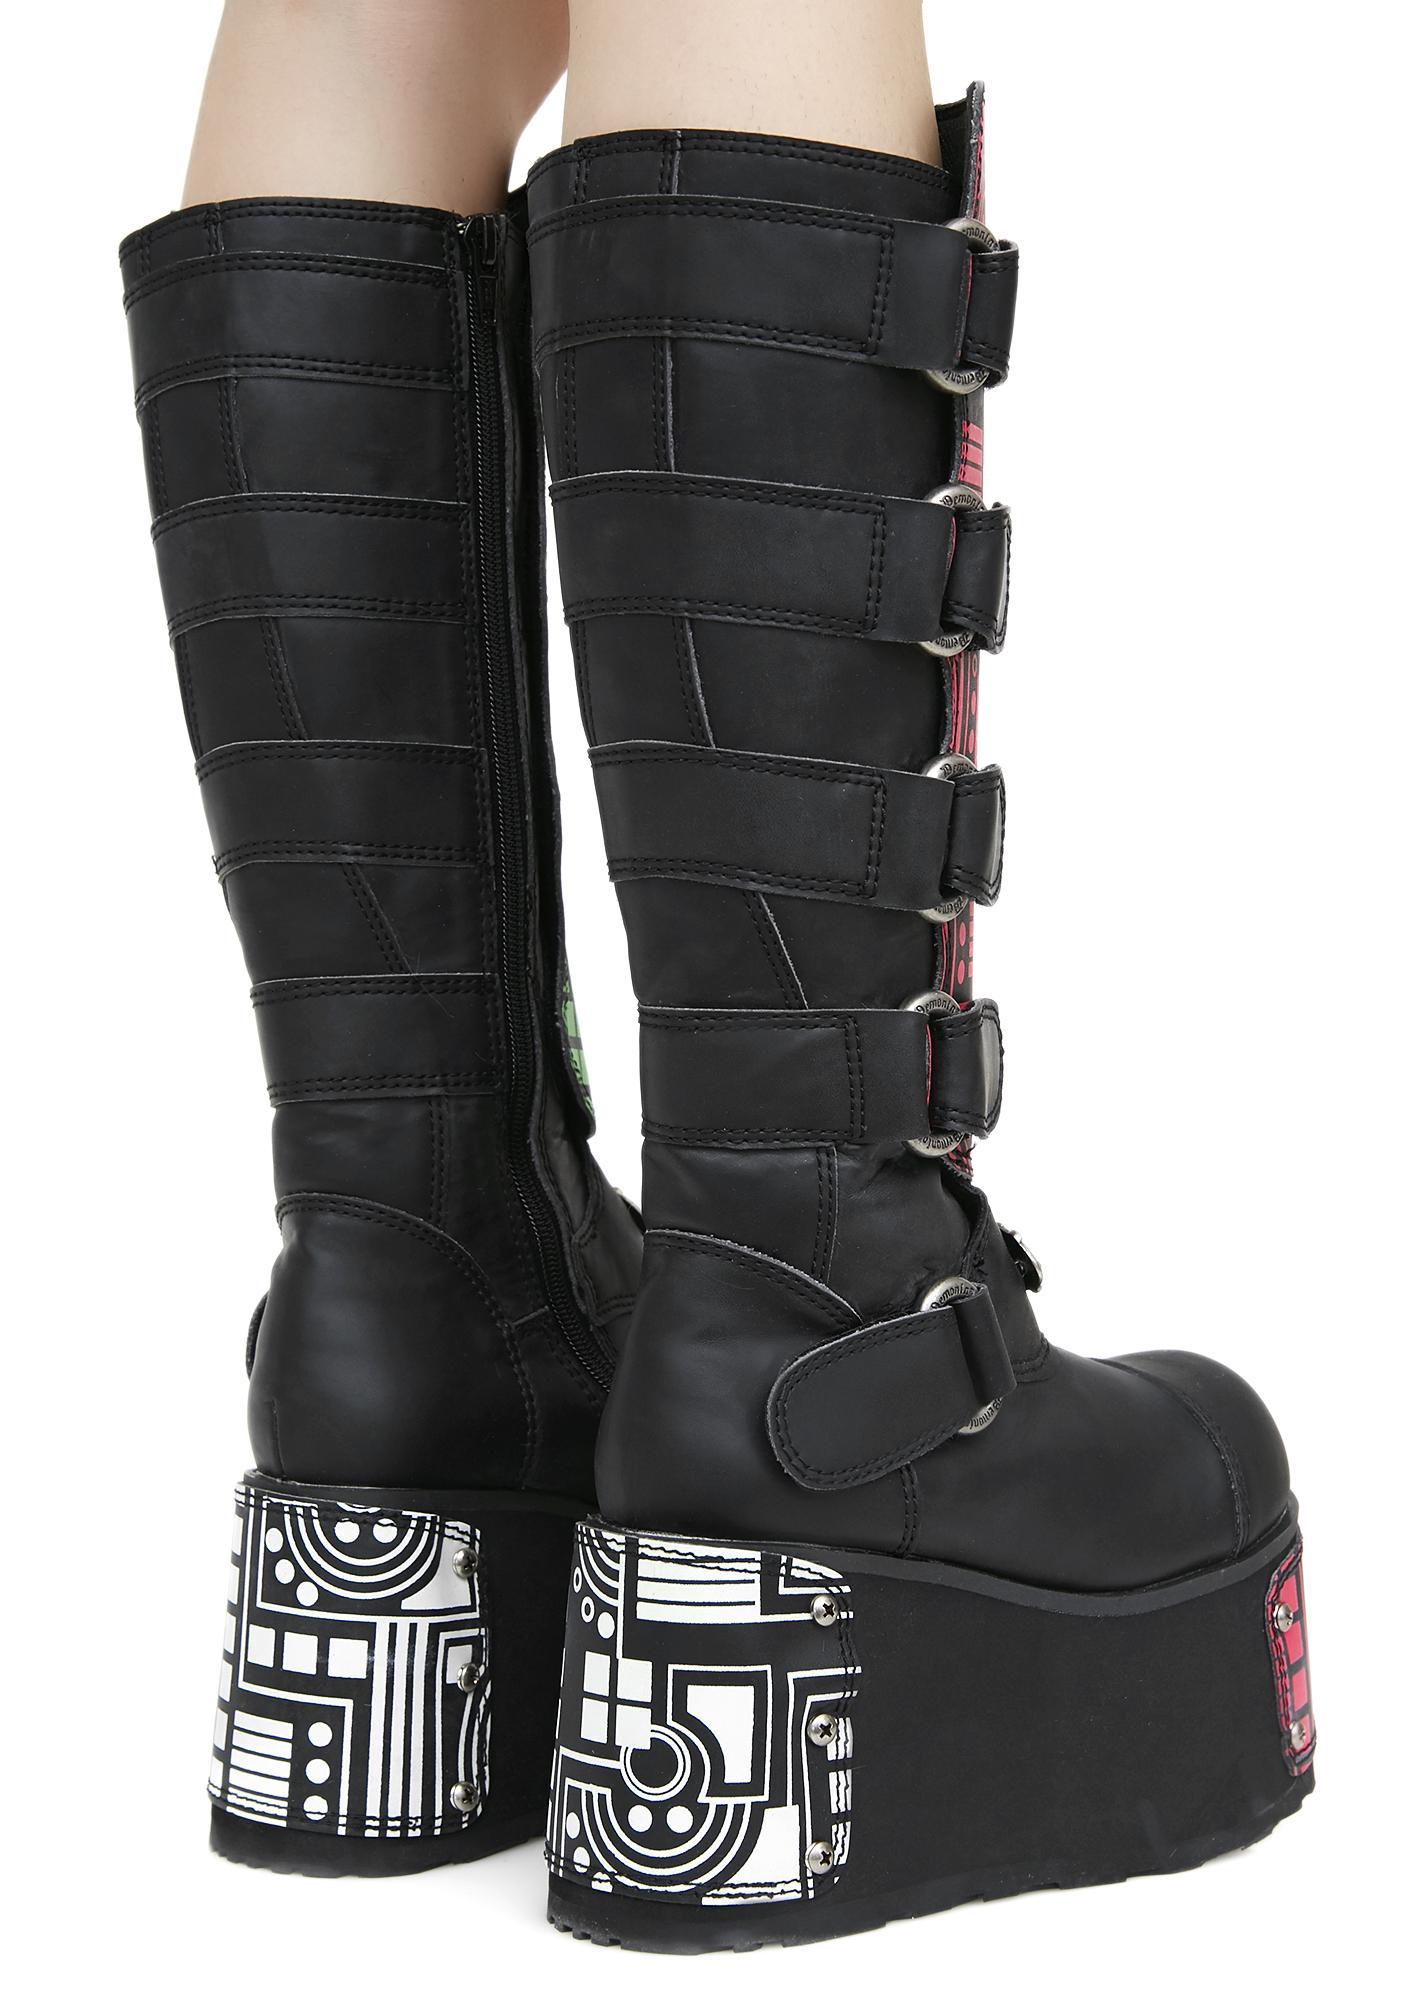 Demonia Hackerz Platform Boots